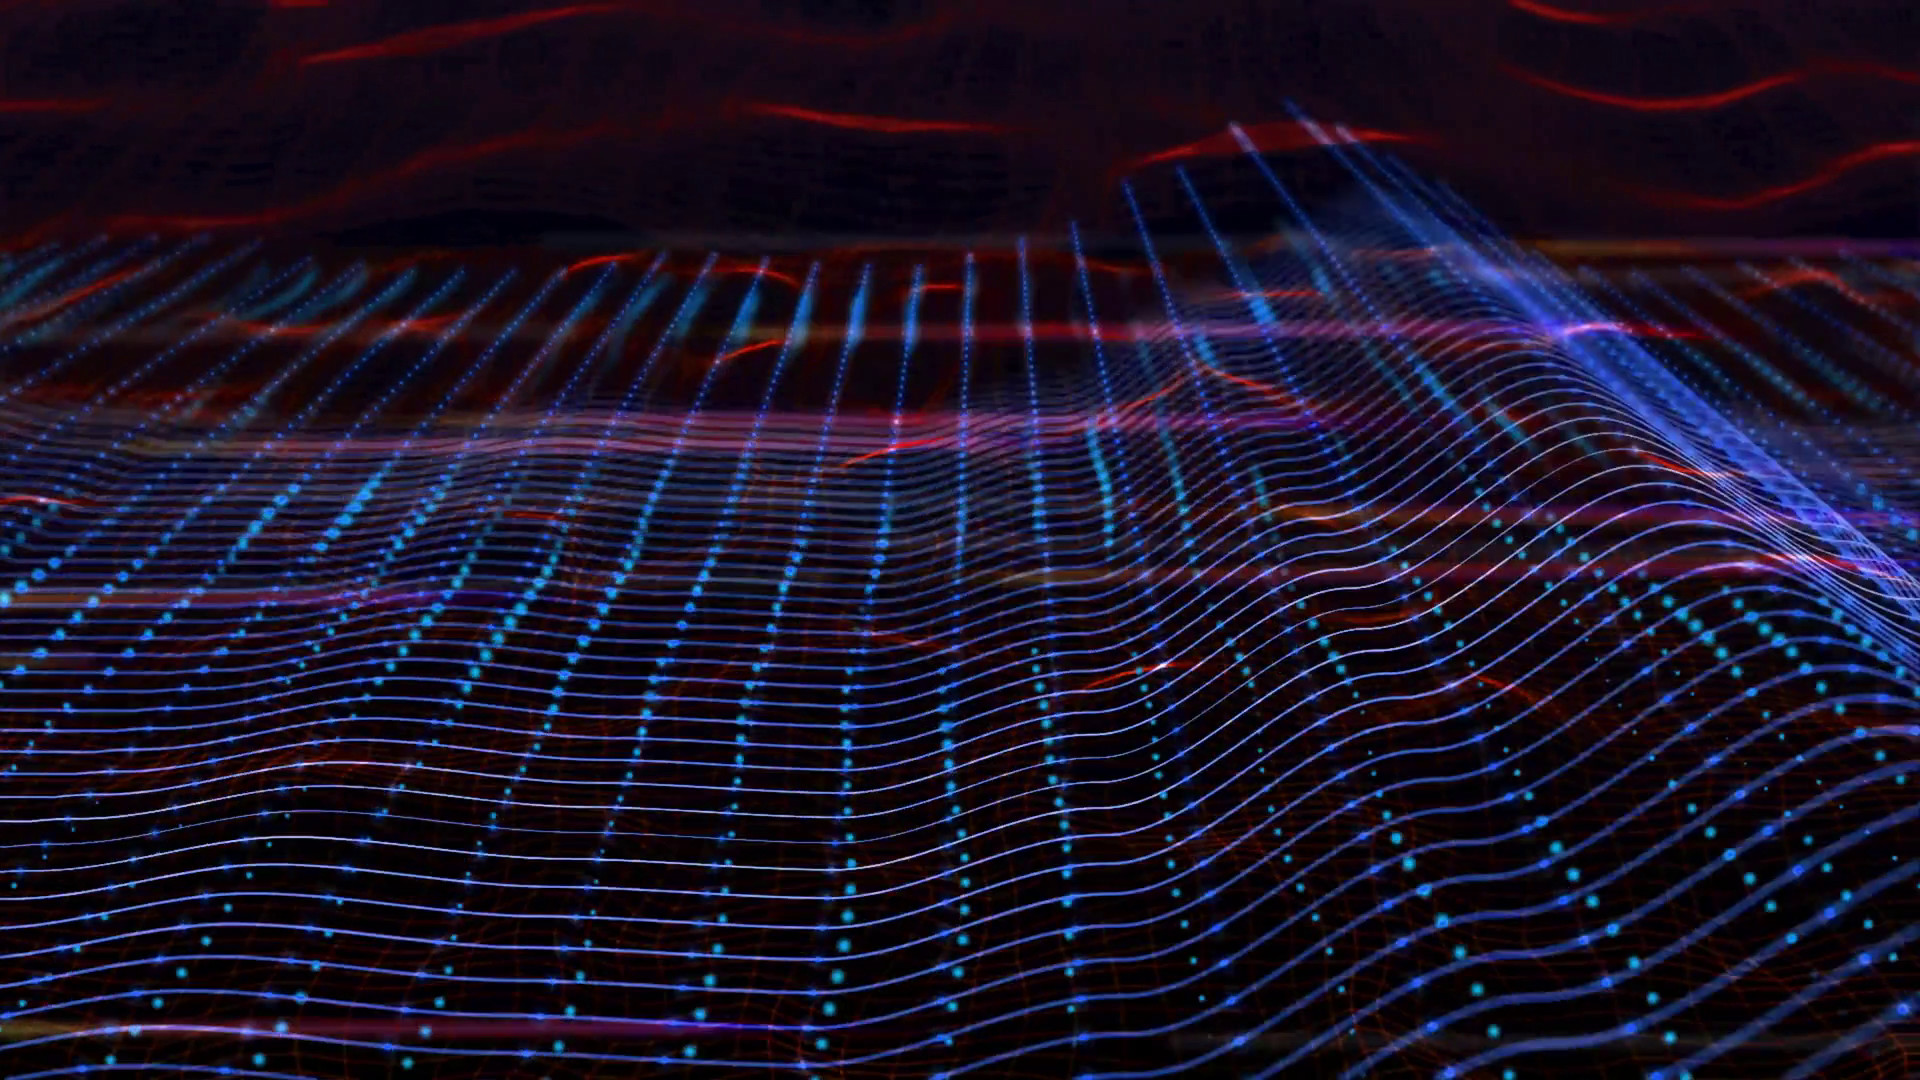 Sound Waves Wallpaper (68+ images)